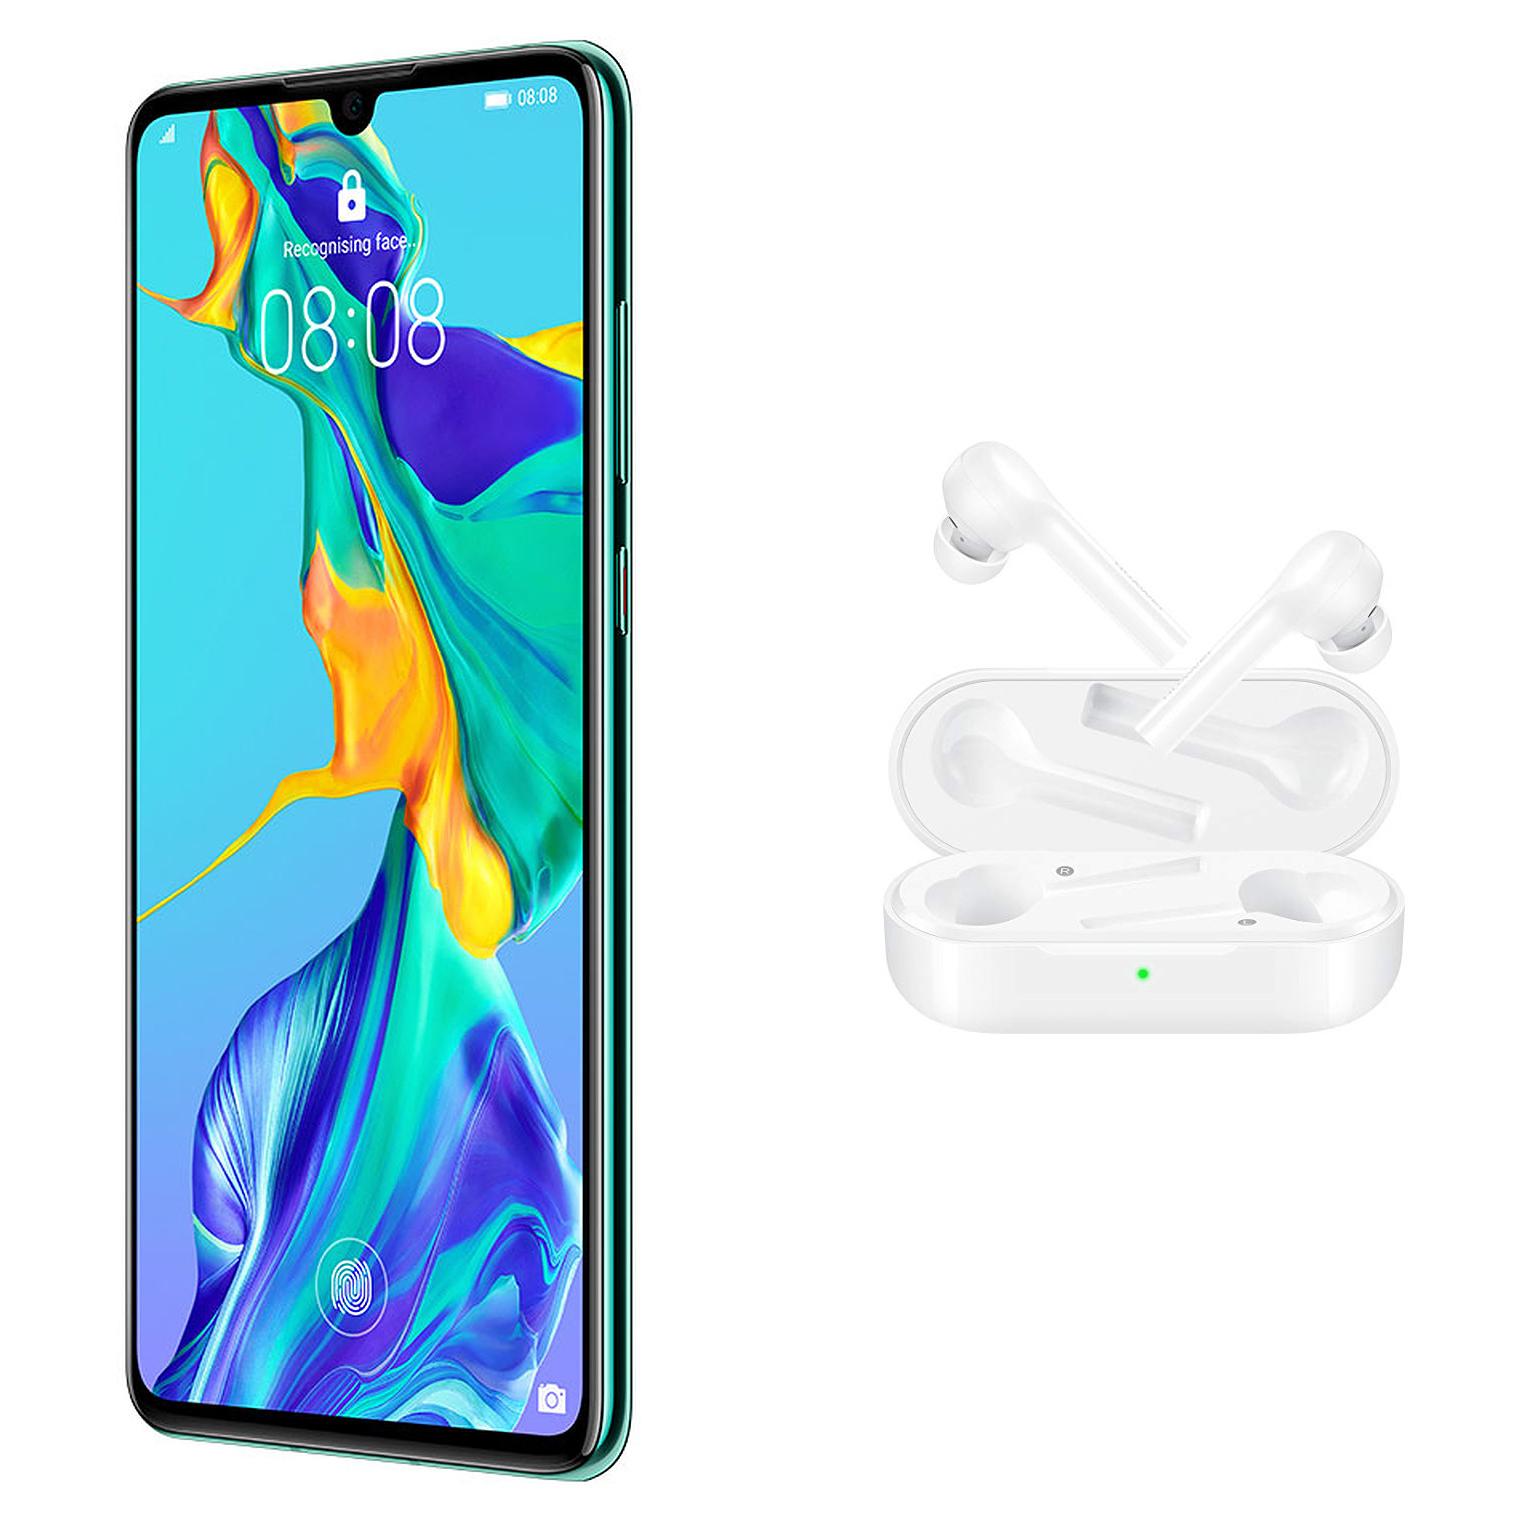 "Smartphone 6.1"" Huawei P30 - FHD+, Kirin 980, RAM 6 Go, 128 Go + FreeBuds Lite (via formulaire) + 124.75€ en SuperPoints (Boulanger)"